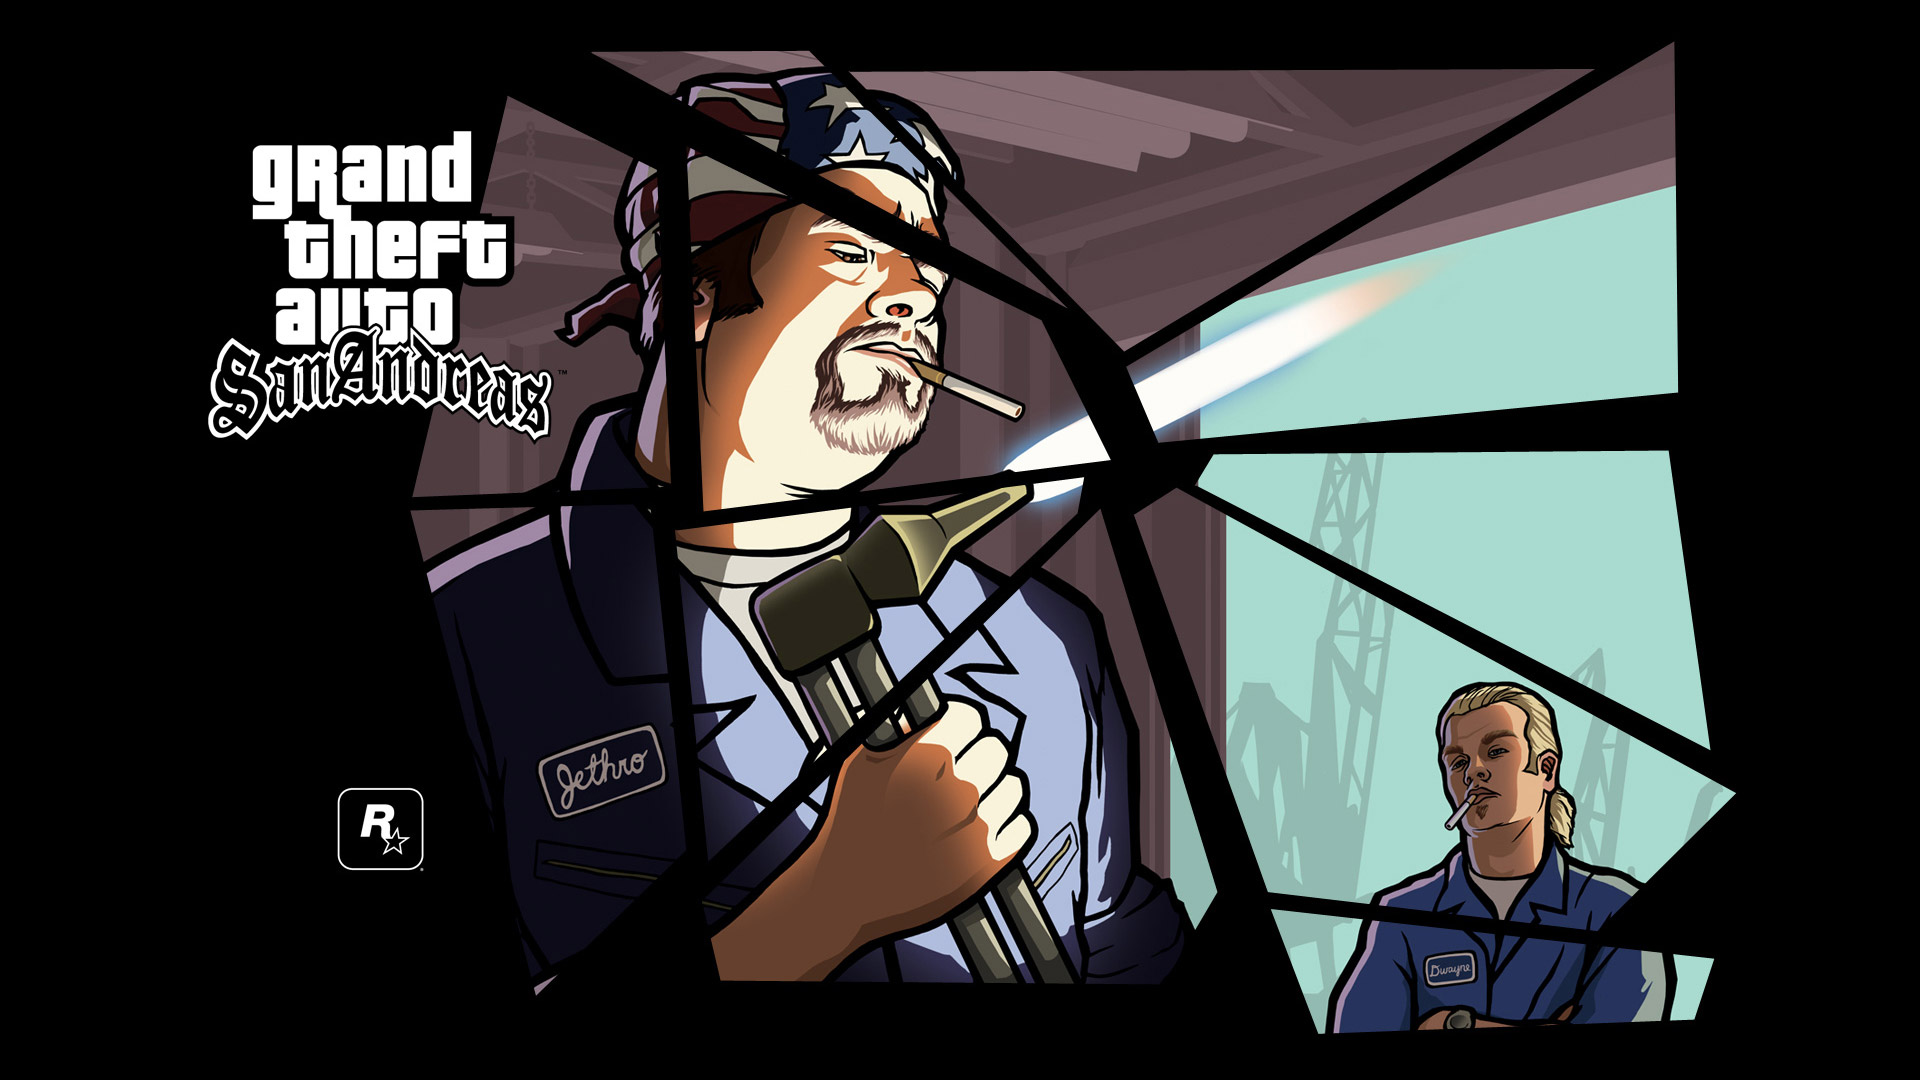 Grand Theft Auto: San Andreas Wallpaper in 1920x1080